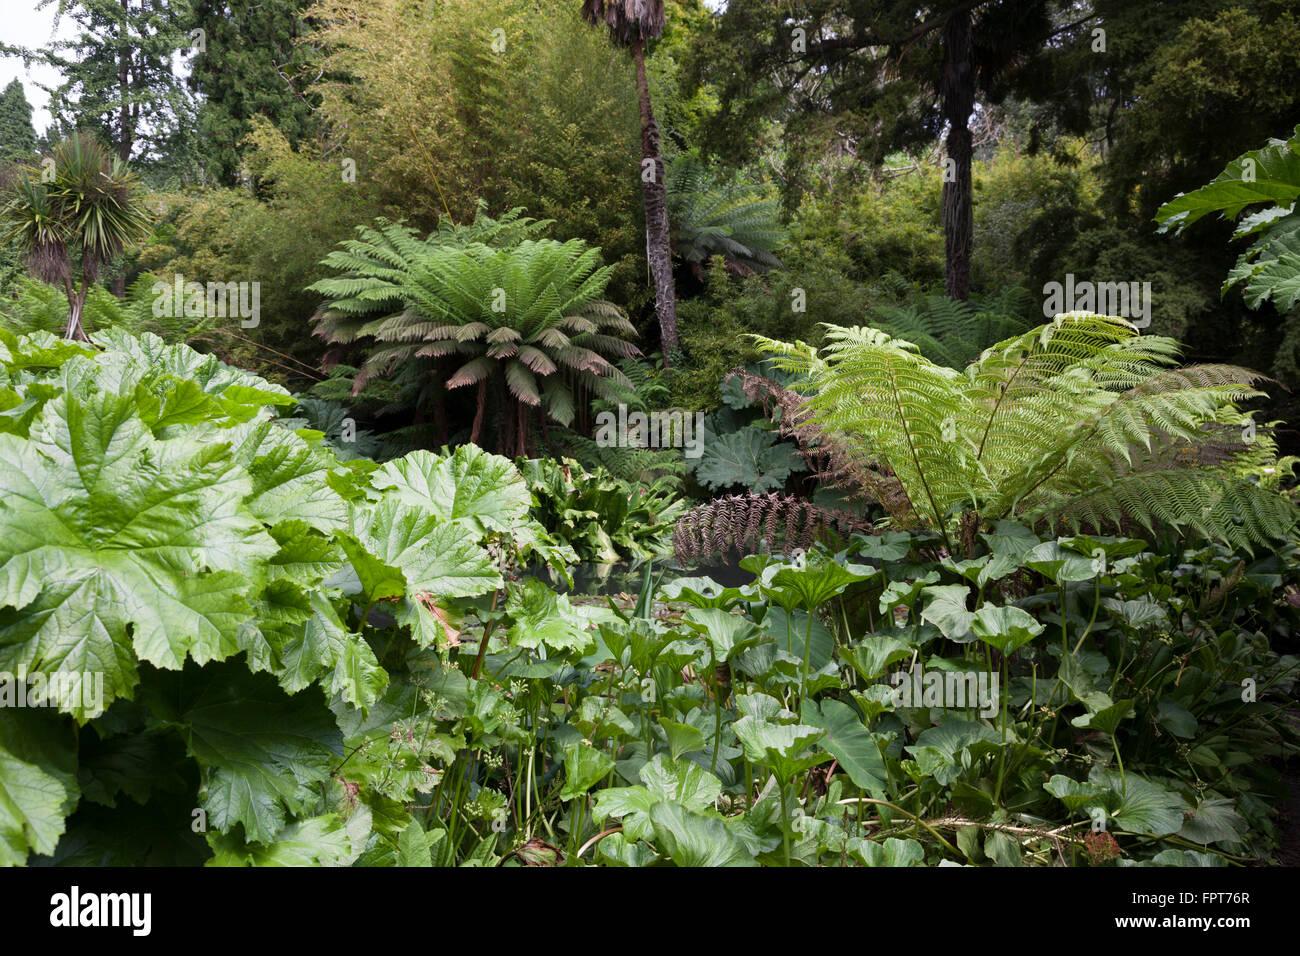 Dschungel in die Lost Gardens of Heligan in Cornwall Stockbild